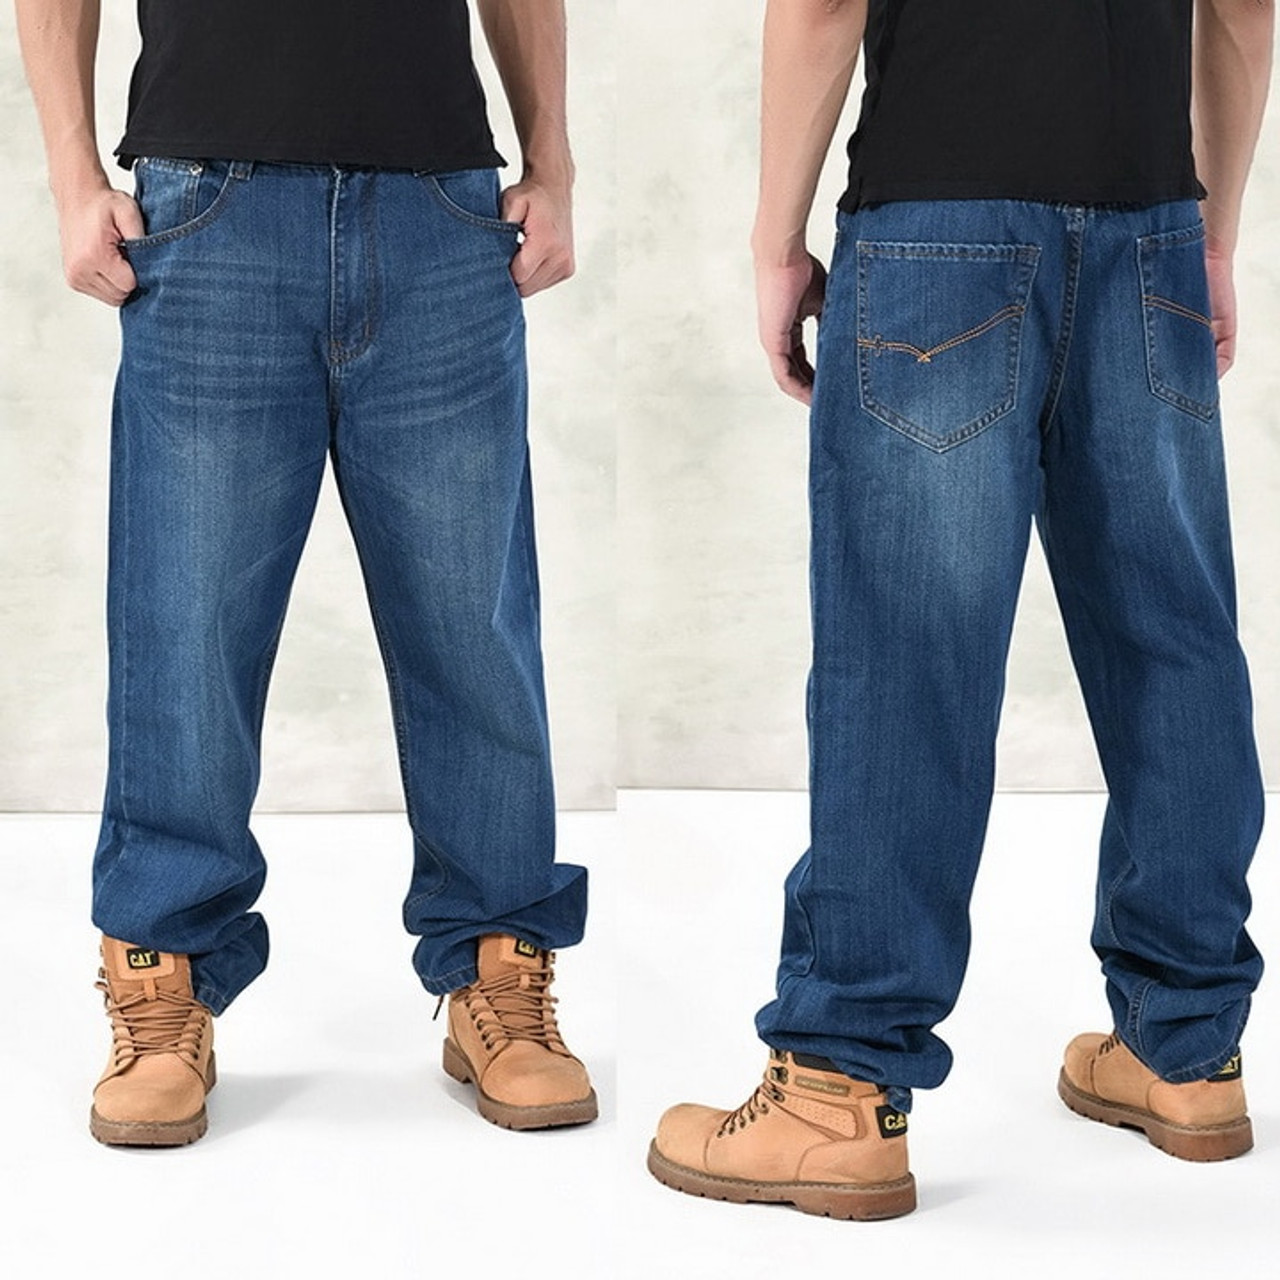 460265f2 ... NEW 2018 Fashion Baggy Style Men's Jeans HipHop Dancers Loose Big  Pocket Boys Skateboard Rap Punk ...